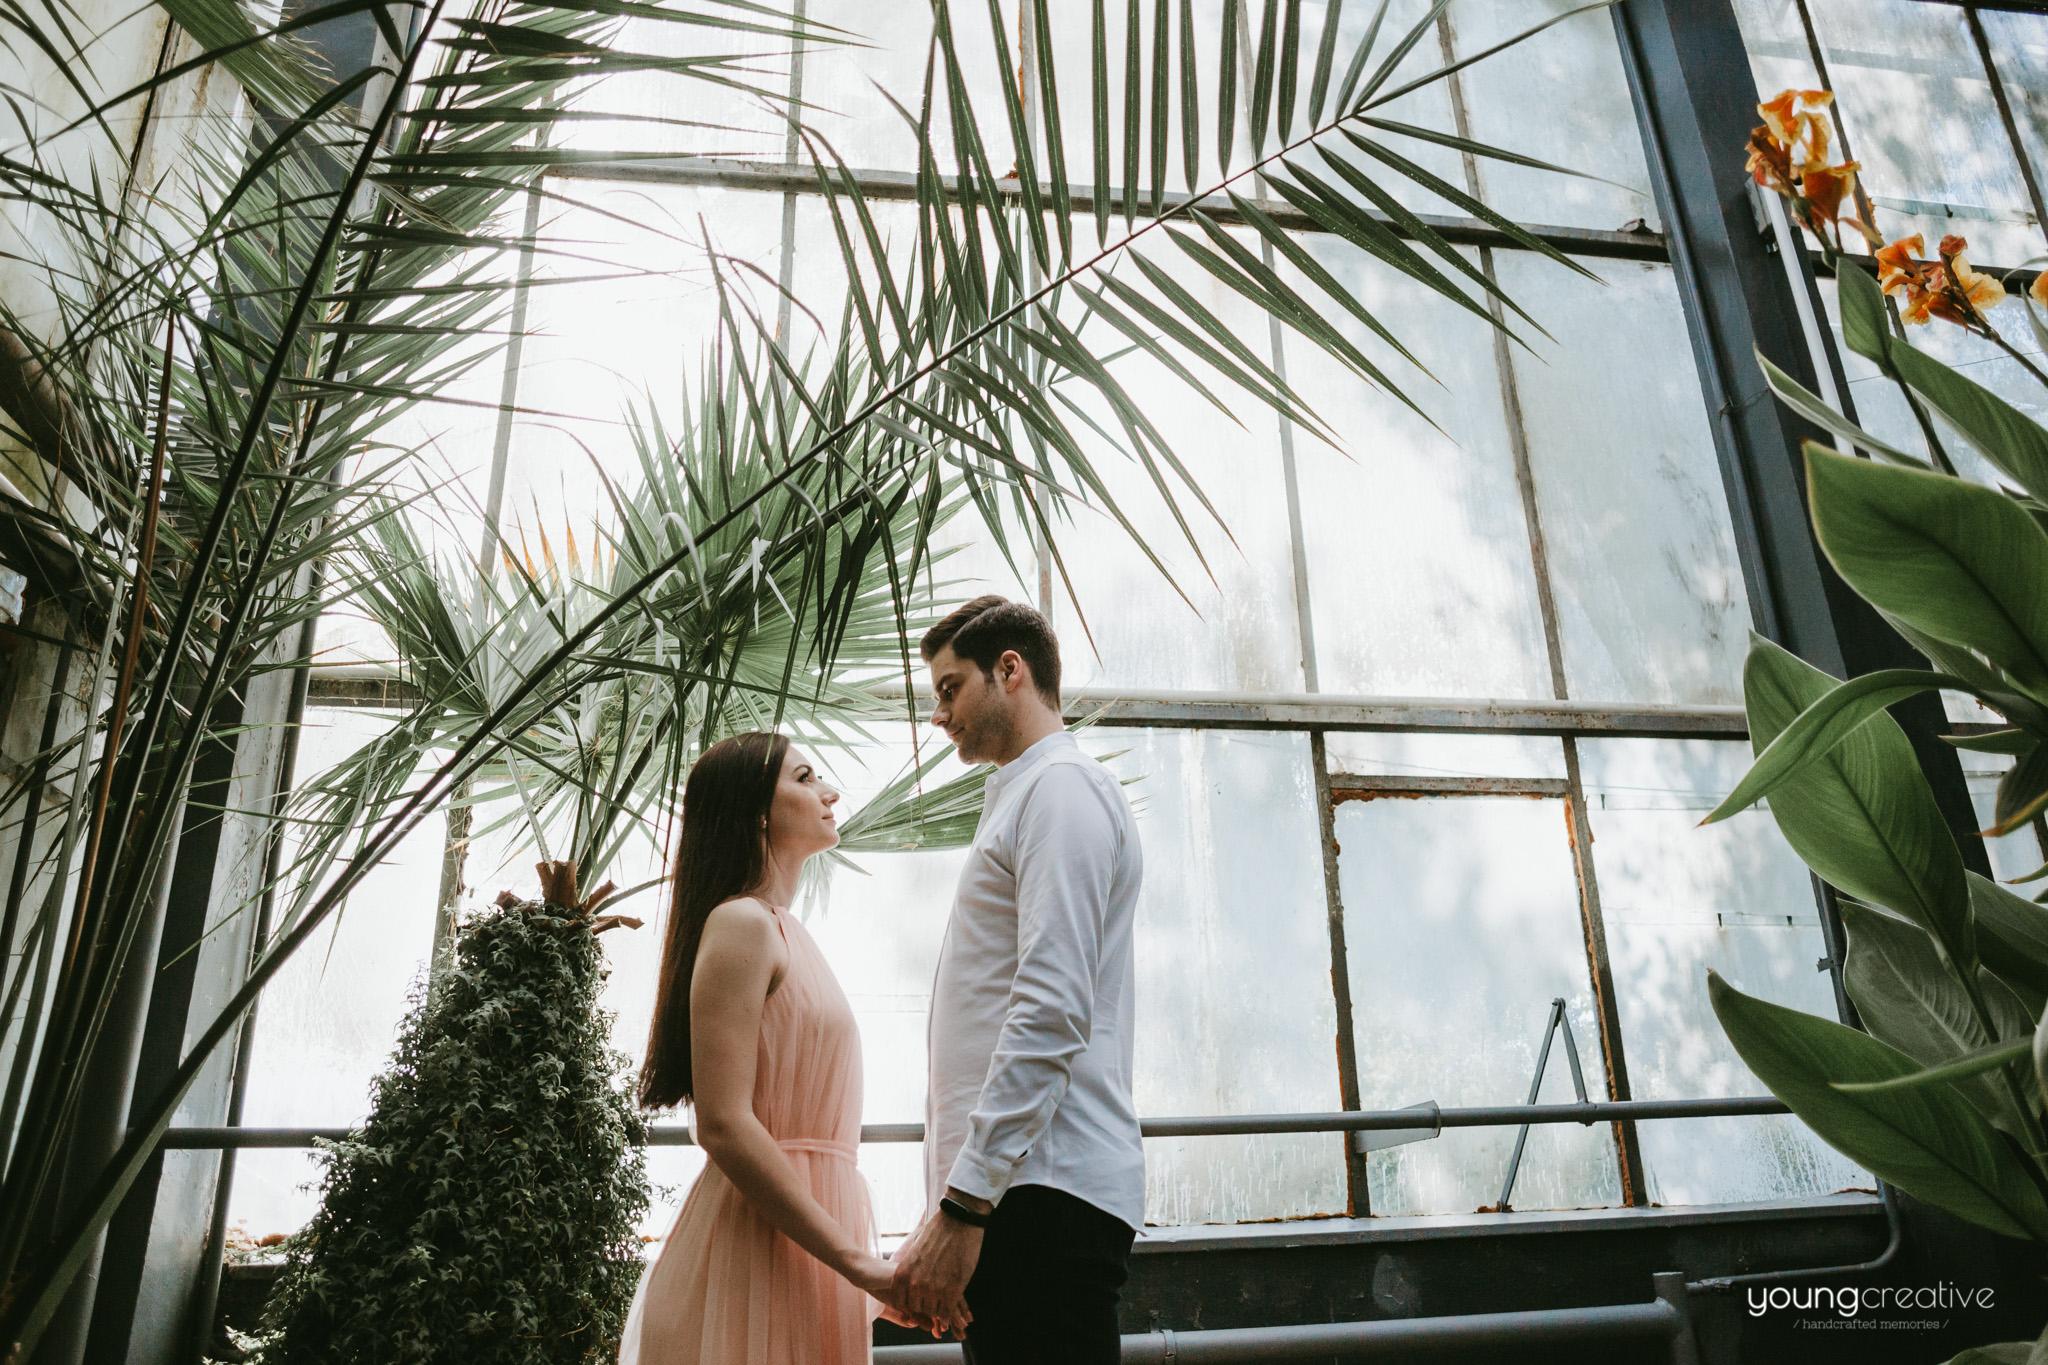 Daiana & Marius | youngcreative.info media © Dan Filipciuc, Cristina Bejan | save the date Iasi